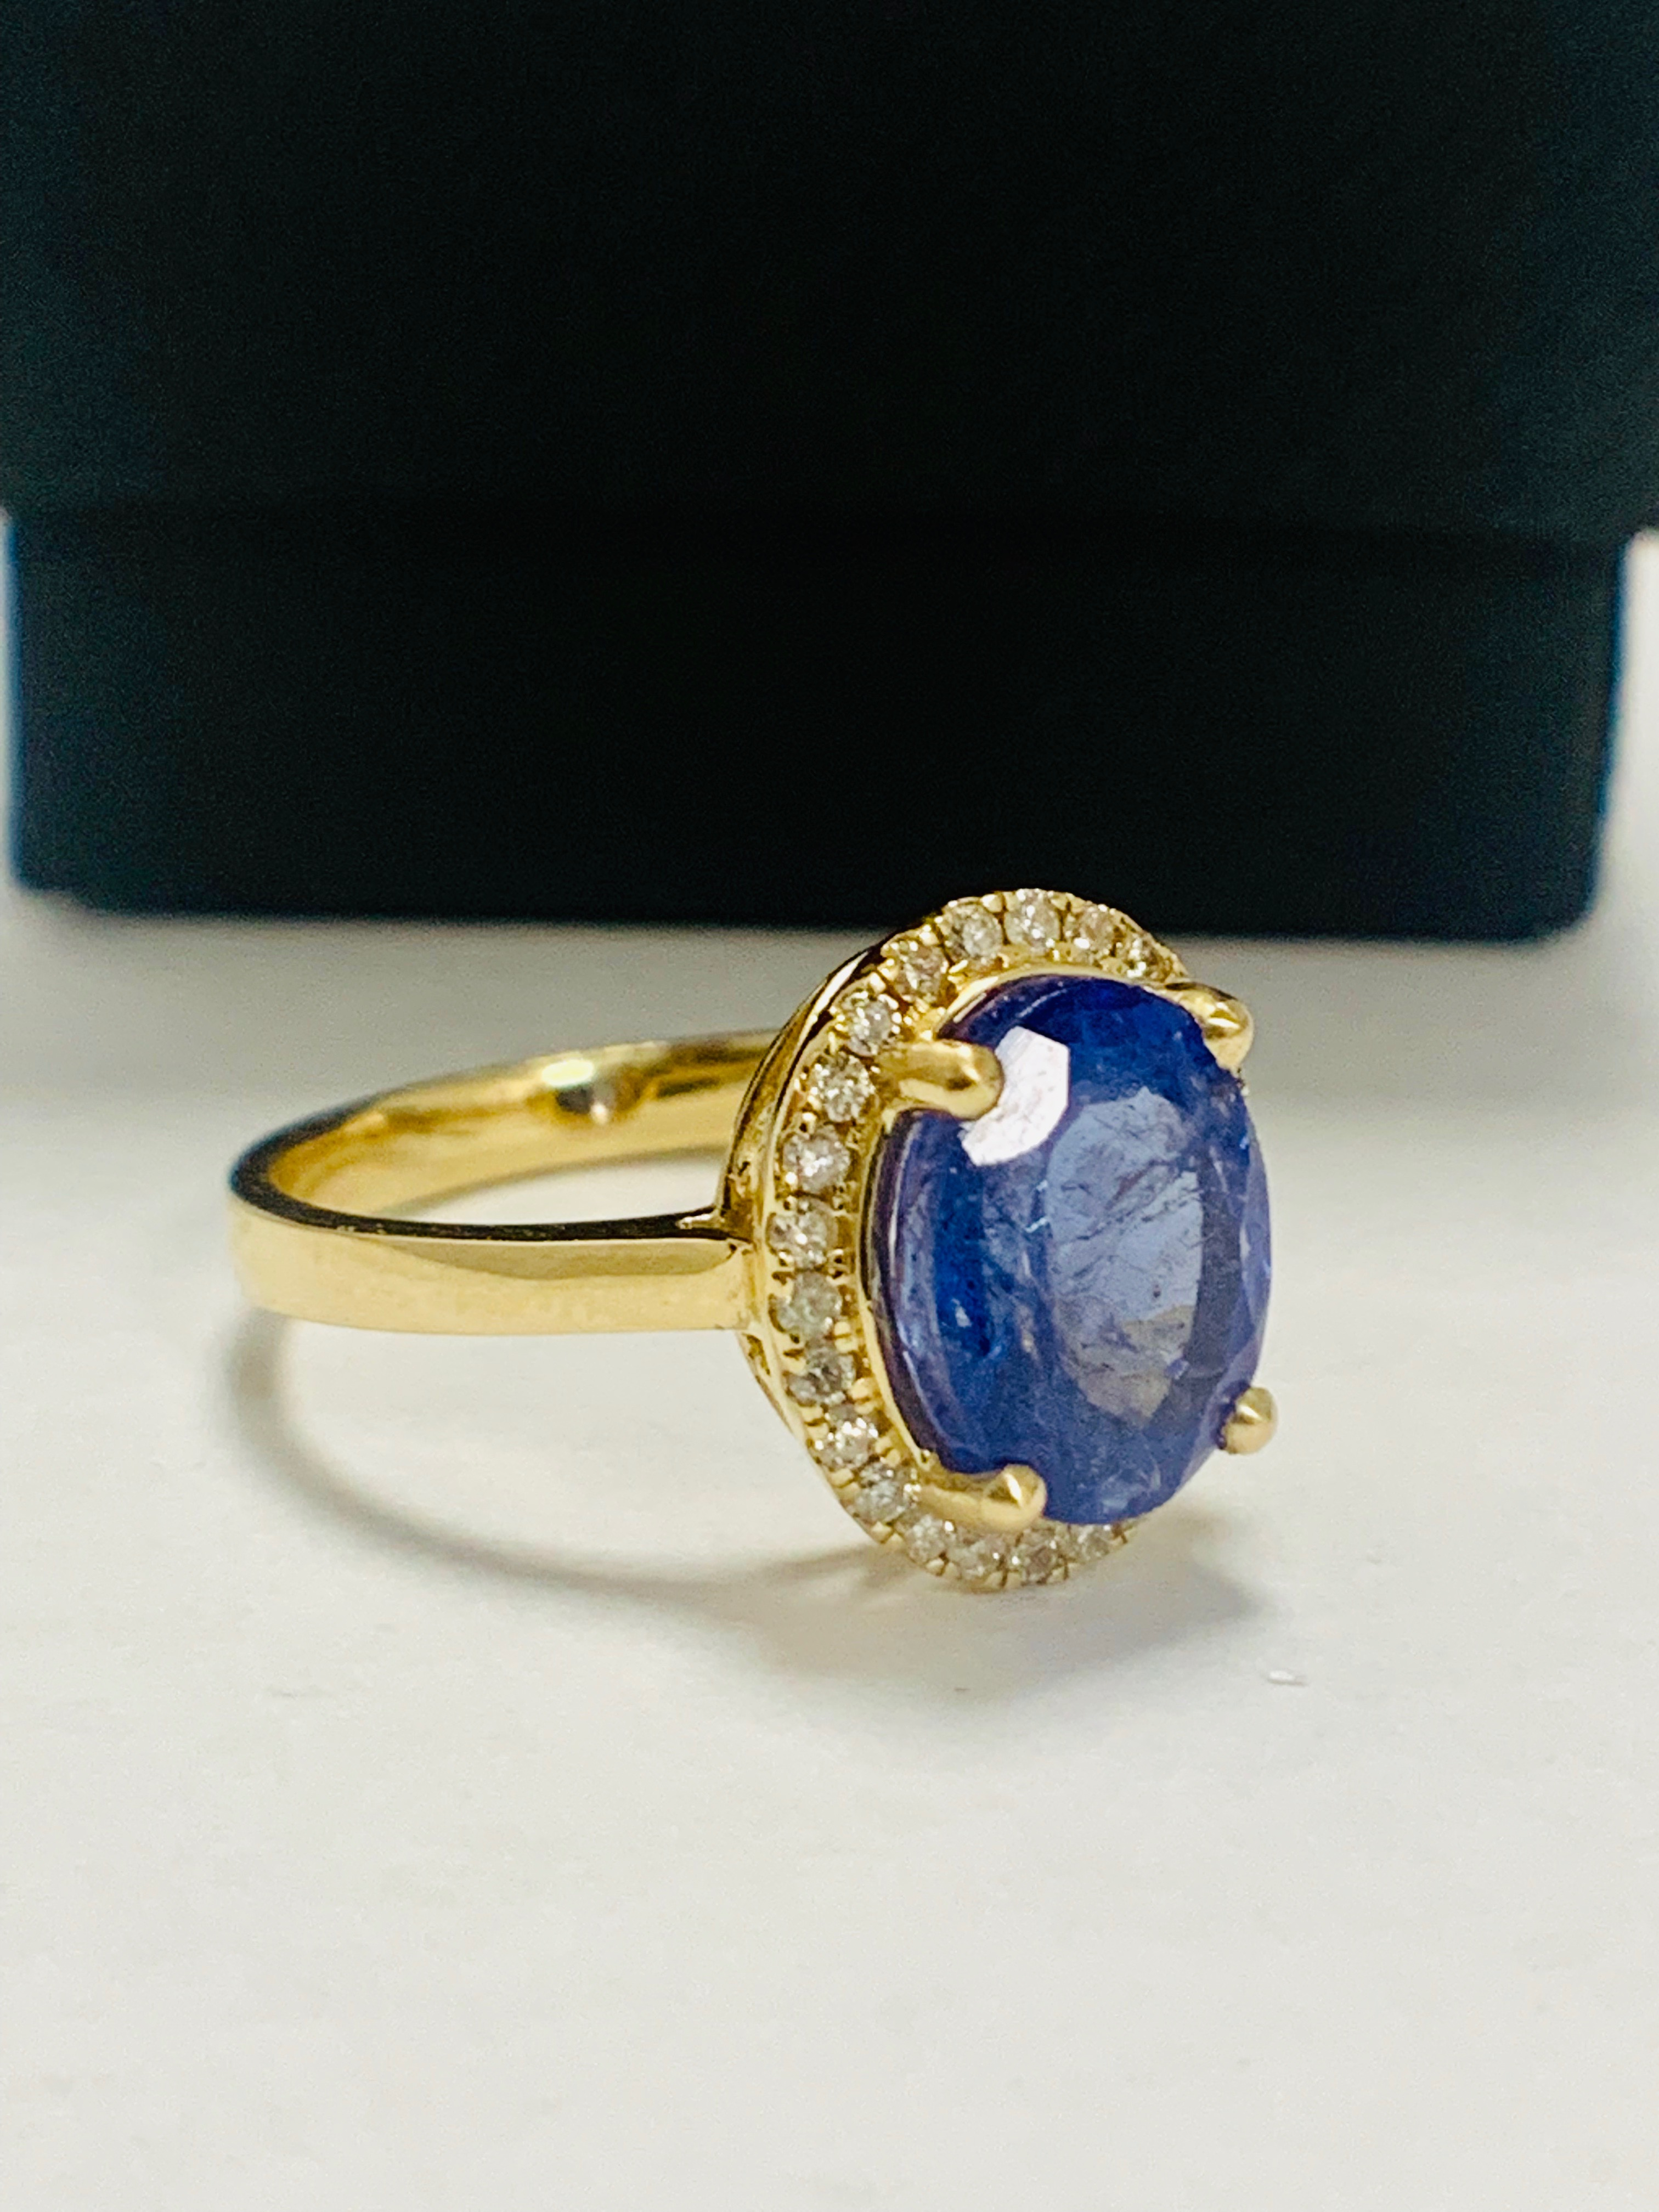 14ct Yellow Gold Tanzanite and Diamond ring - Image 9 of 13